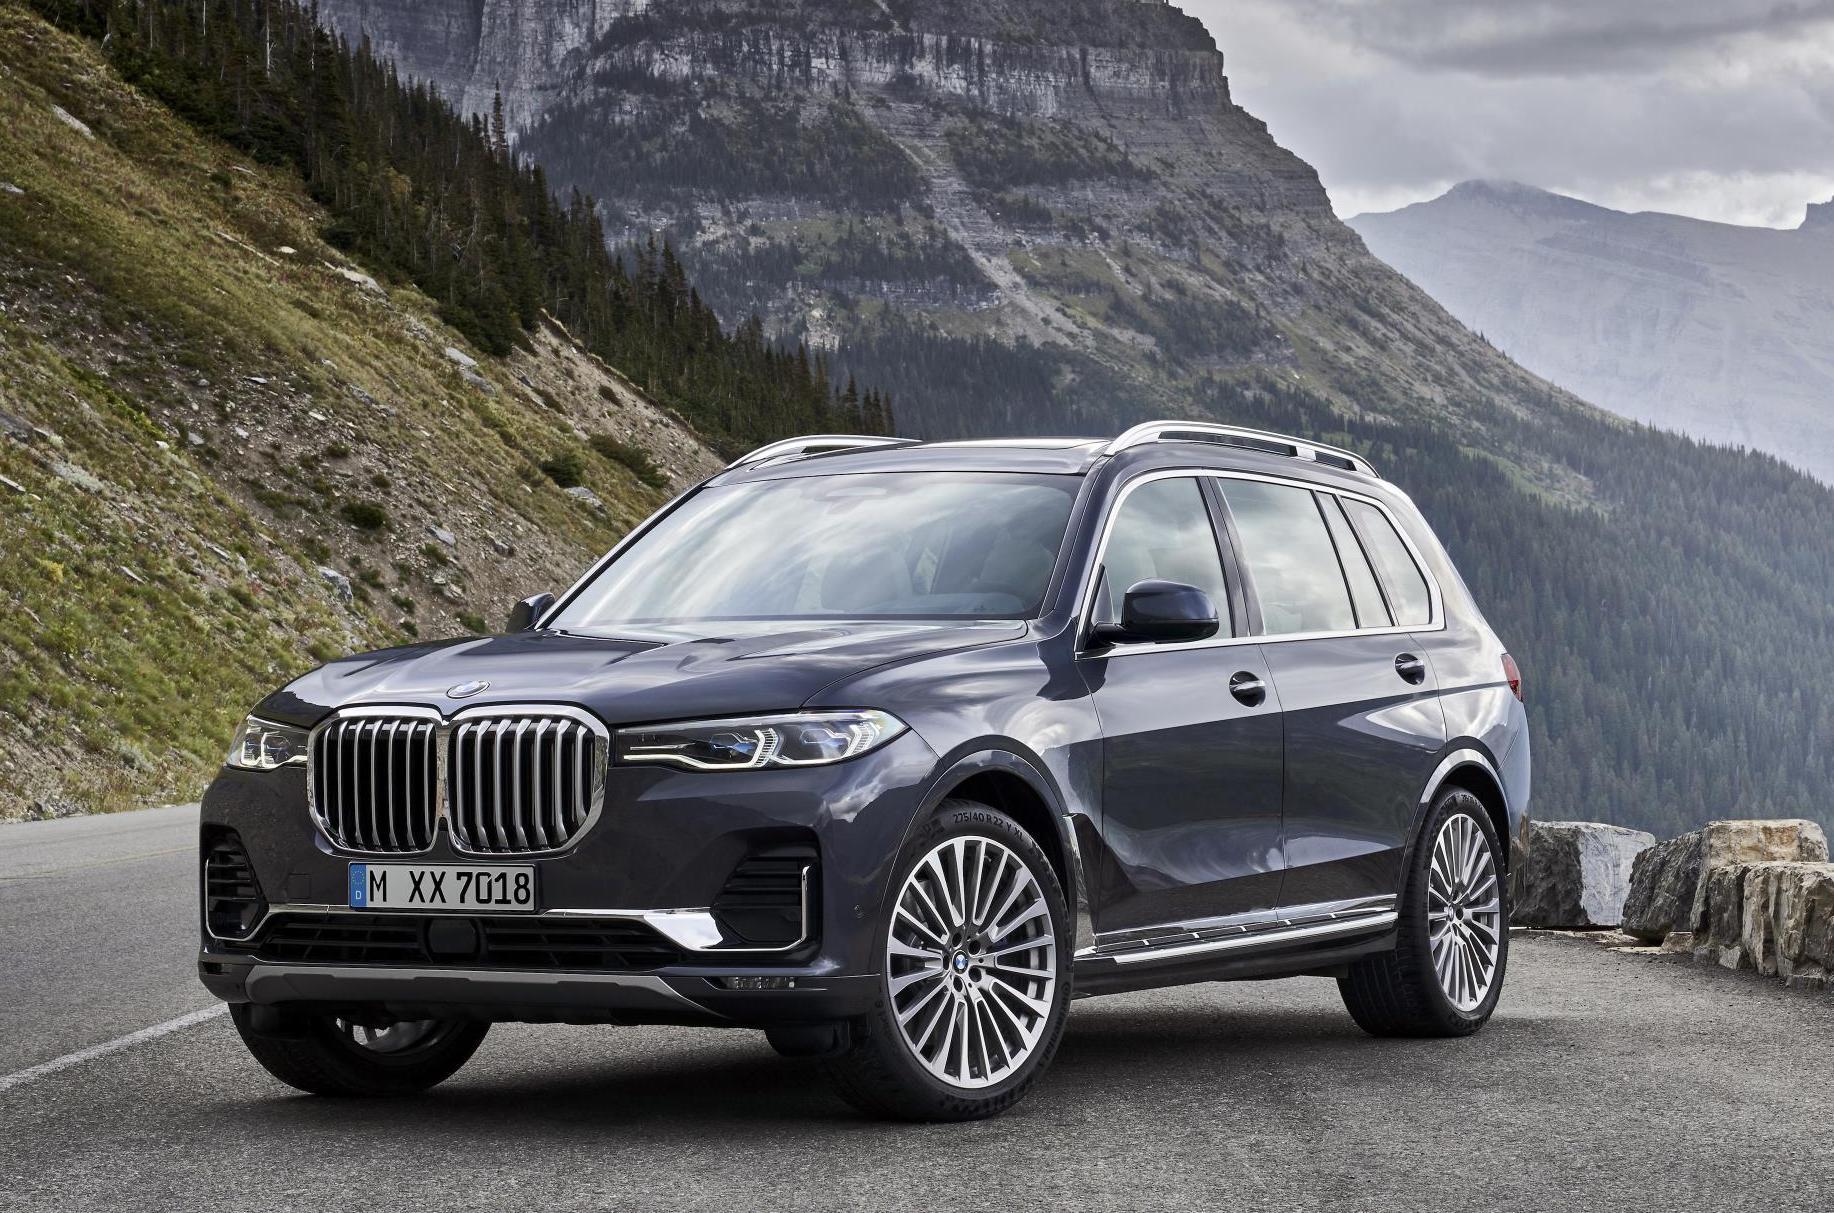 2019 BMW X7 unveiled as new flagship SUV | PerformanceDrive